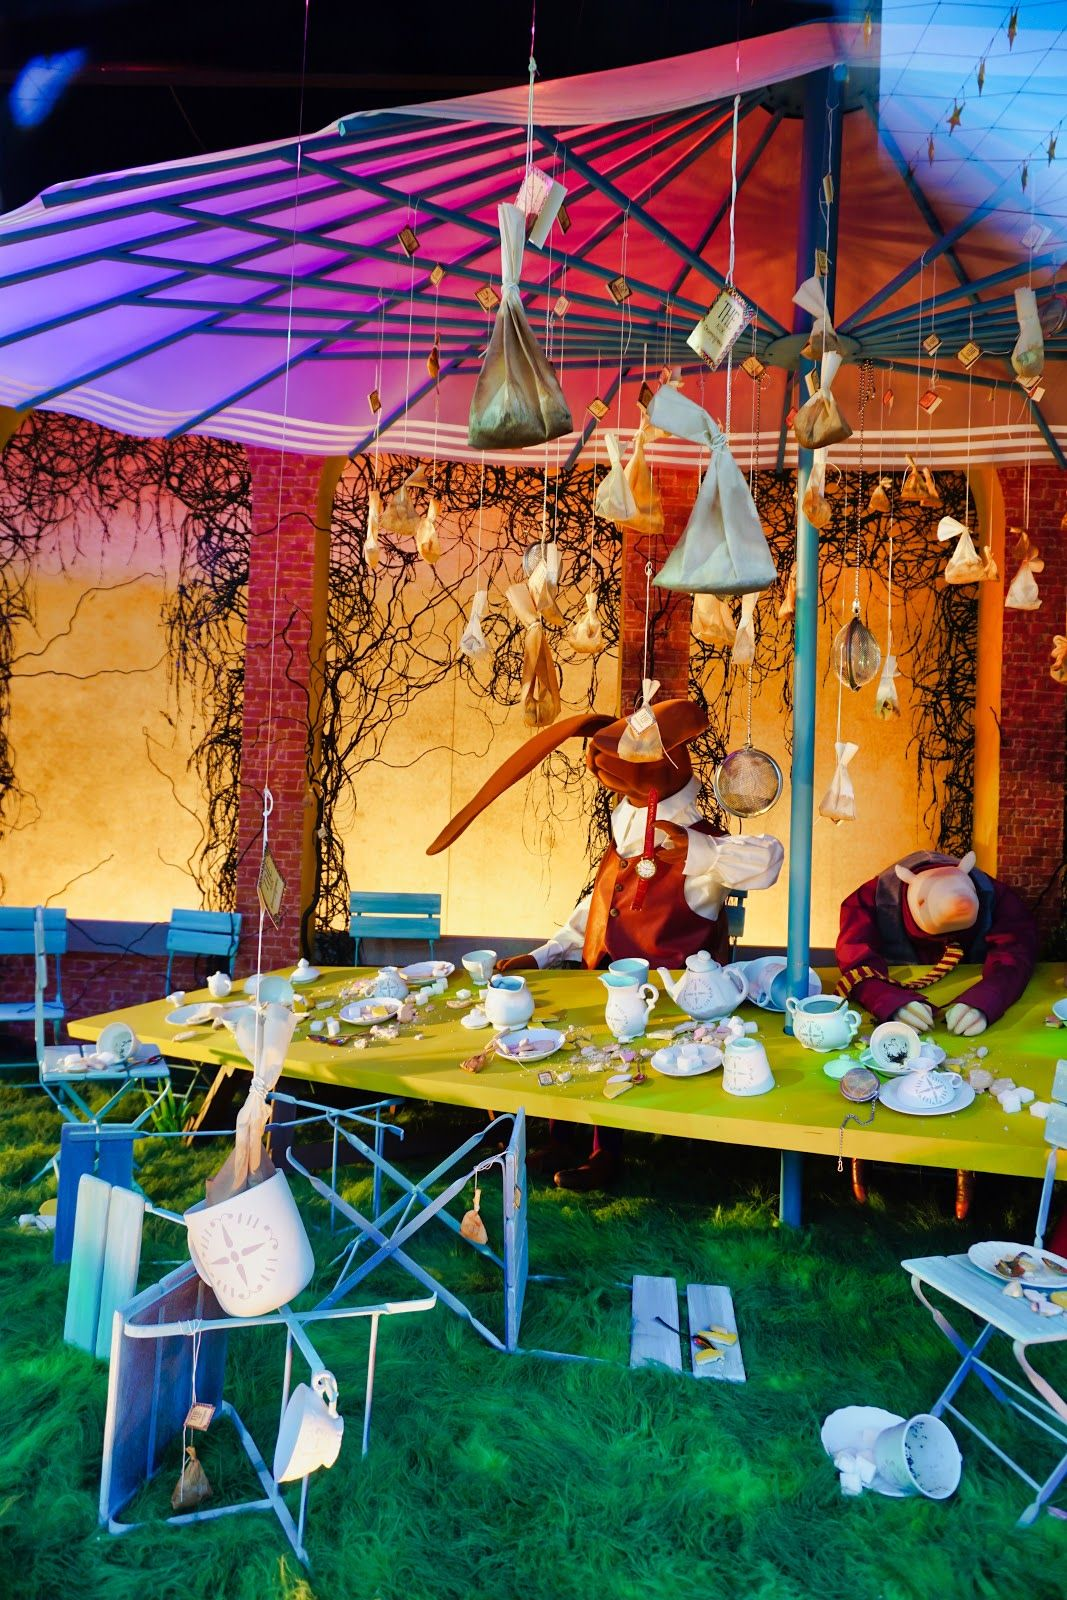 Myer Christmas Windows 2018 (With images)   Christmas window, Alice in wonderland, Christmas